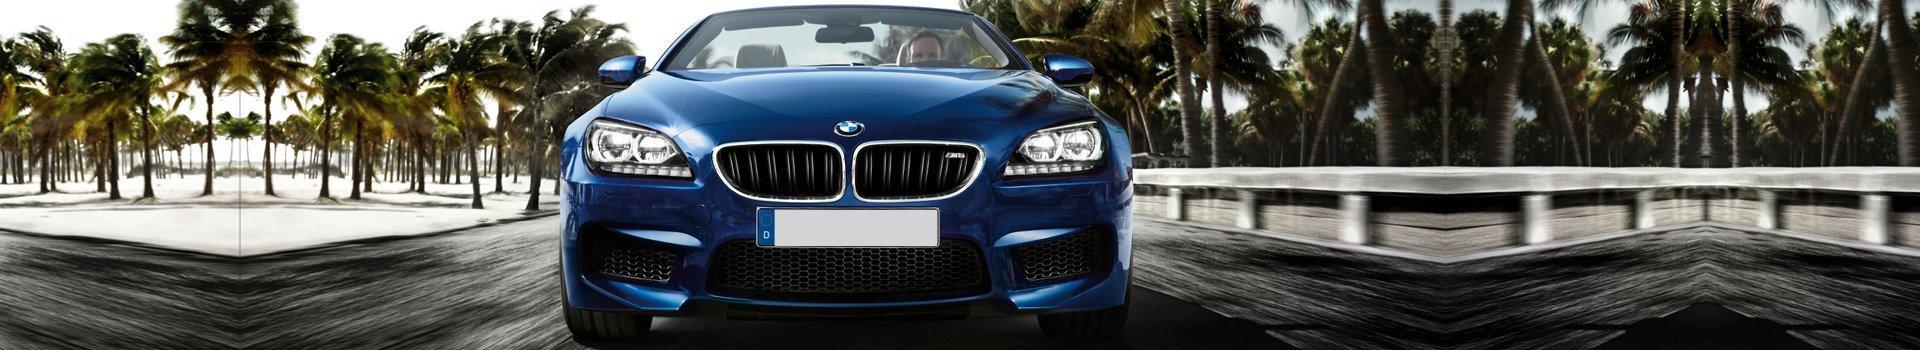 BMW Repair Service Maintenance Specialist Pembroke Pines FL